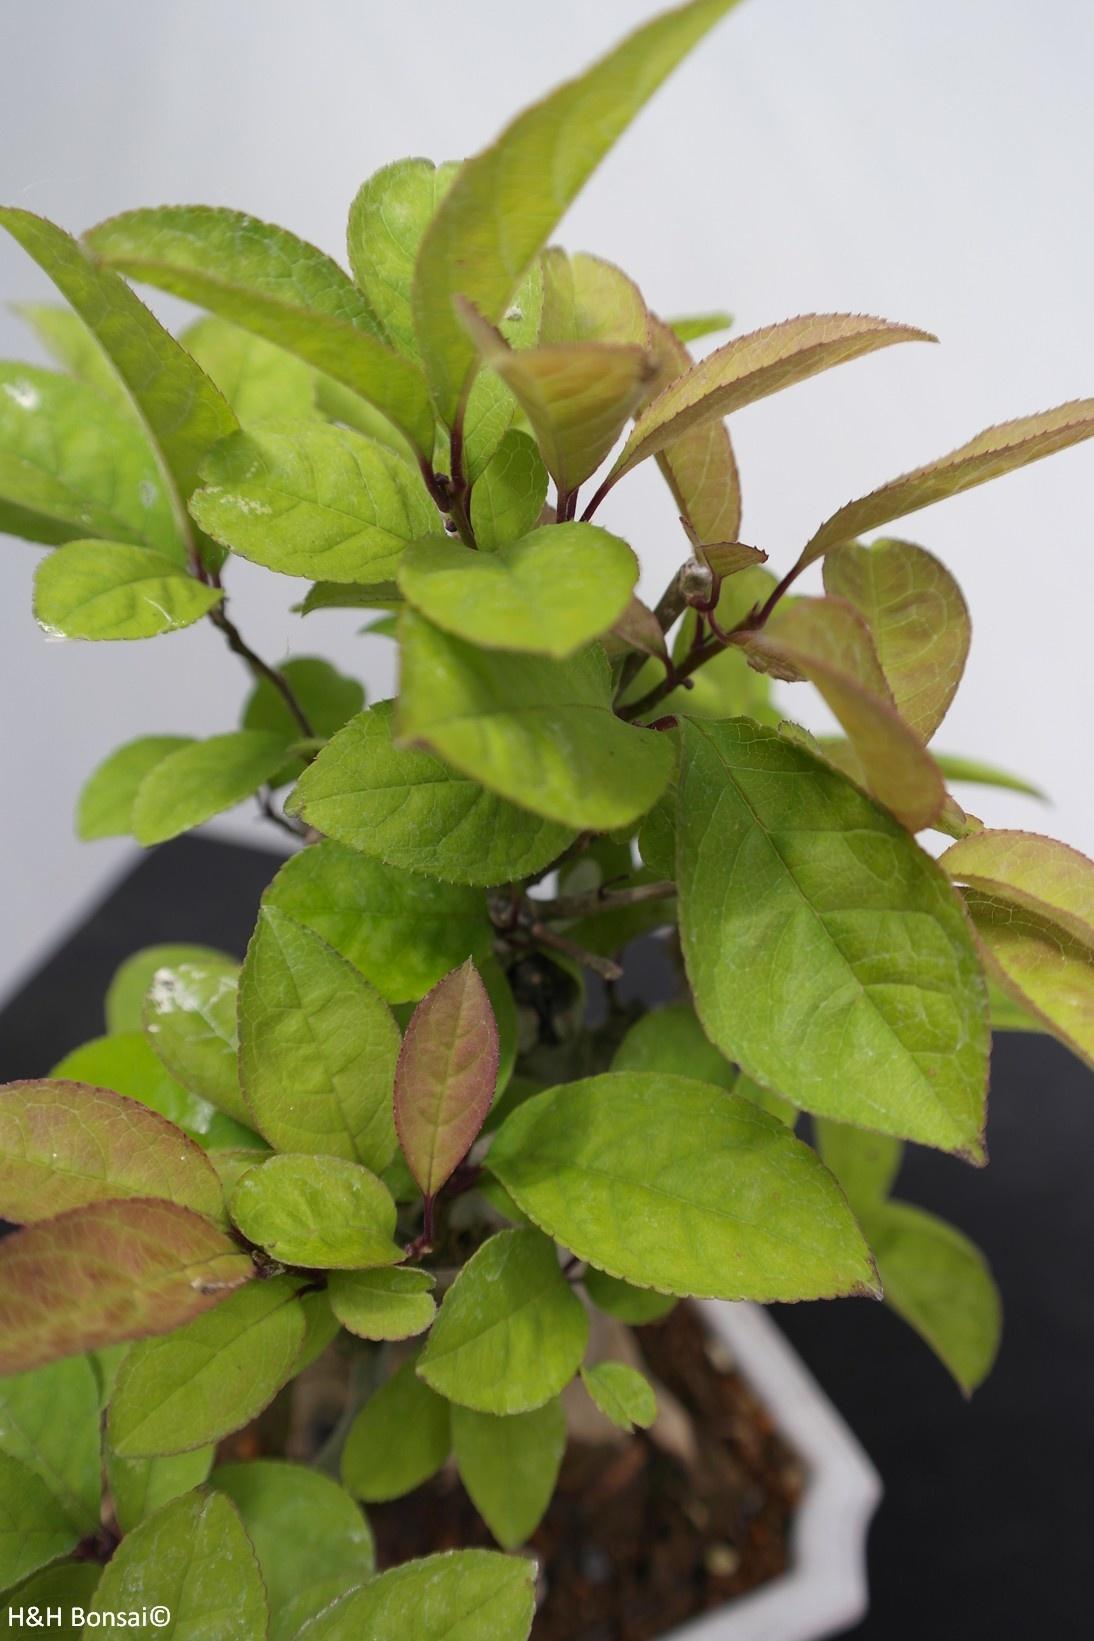 Bonsai Shohin Ilex serrata, Japanse winterbes, nr. 7781